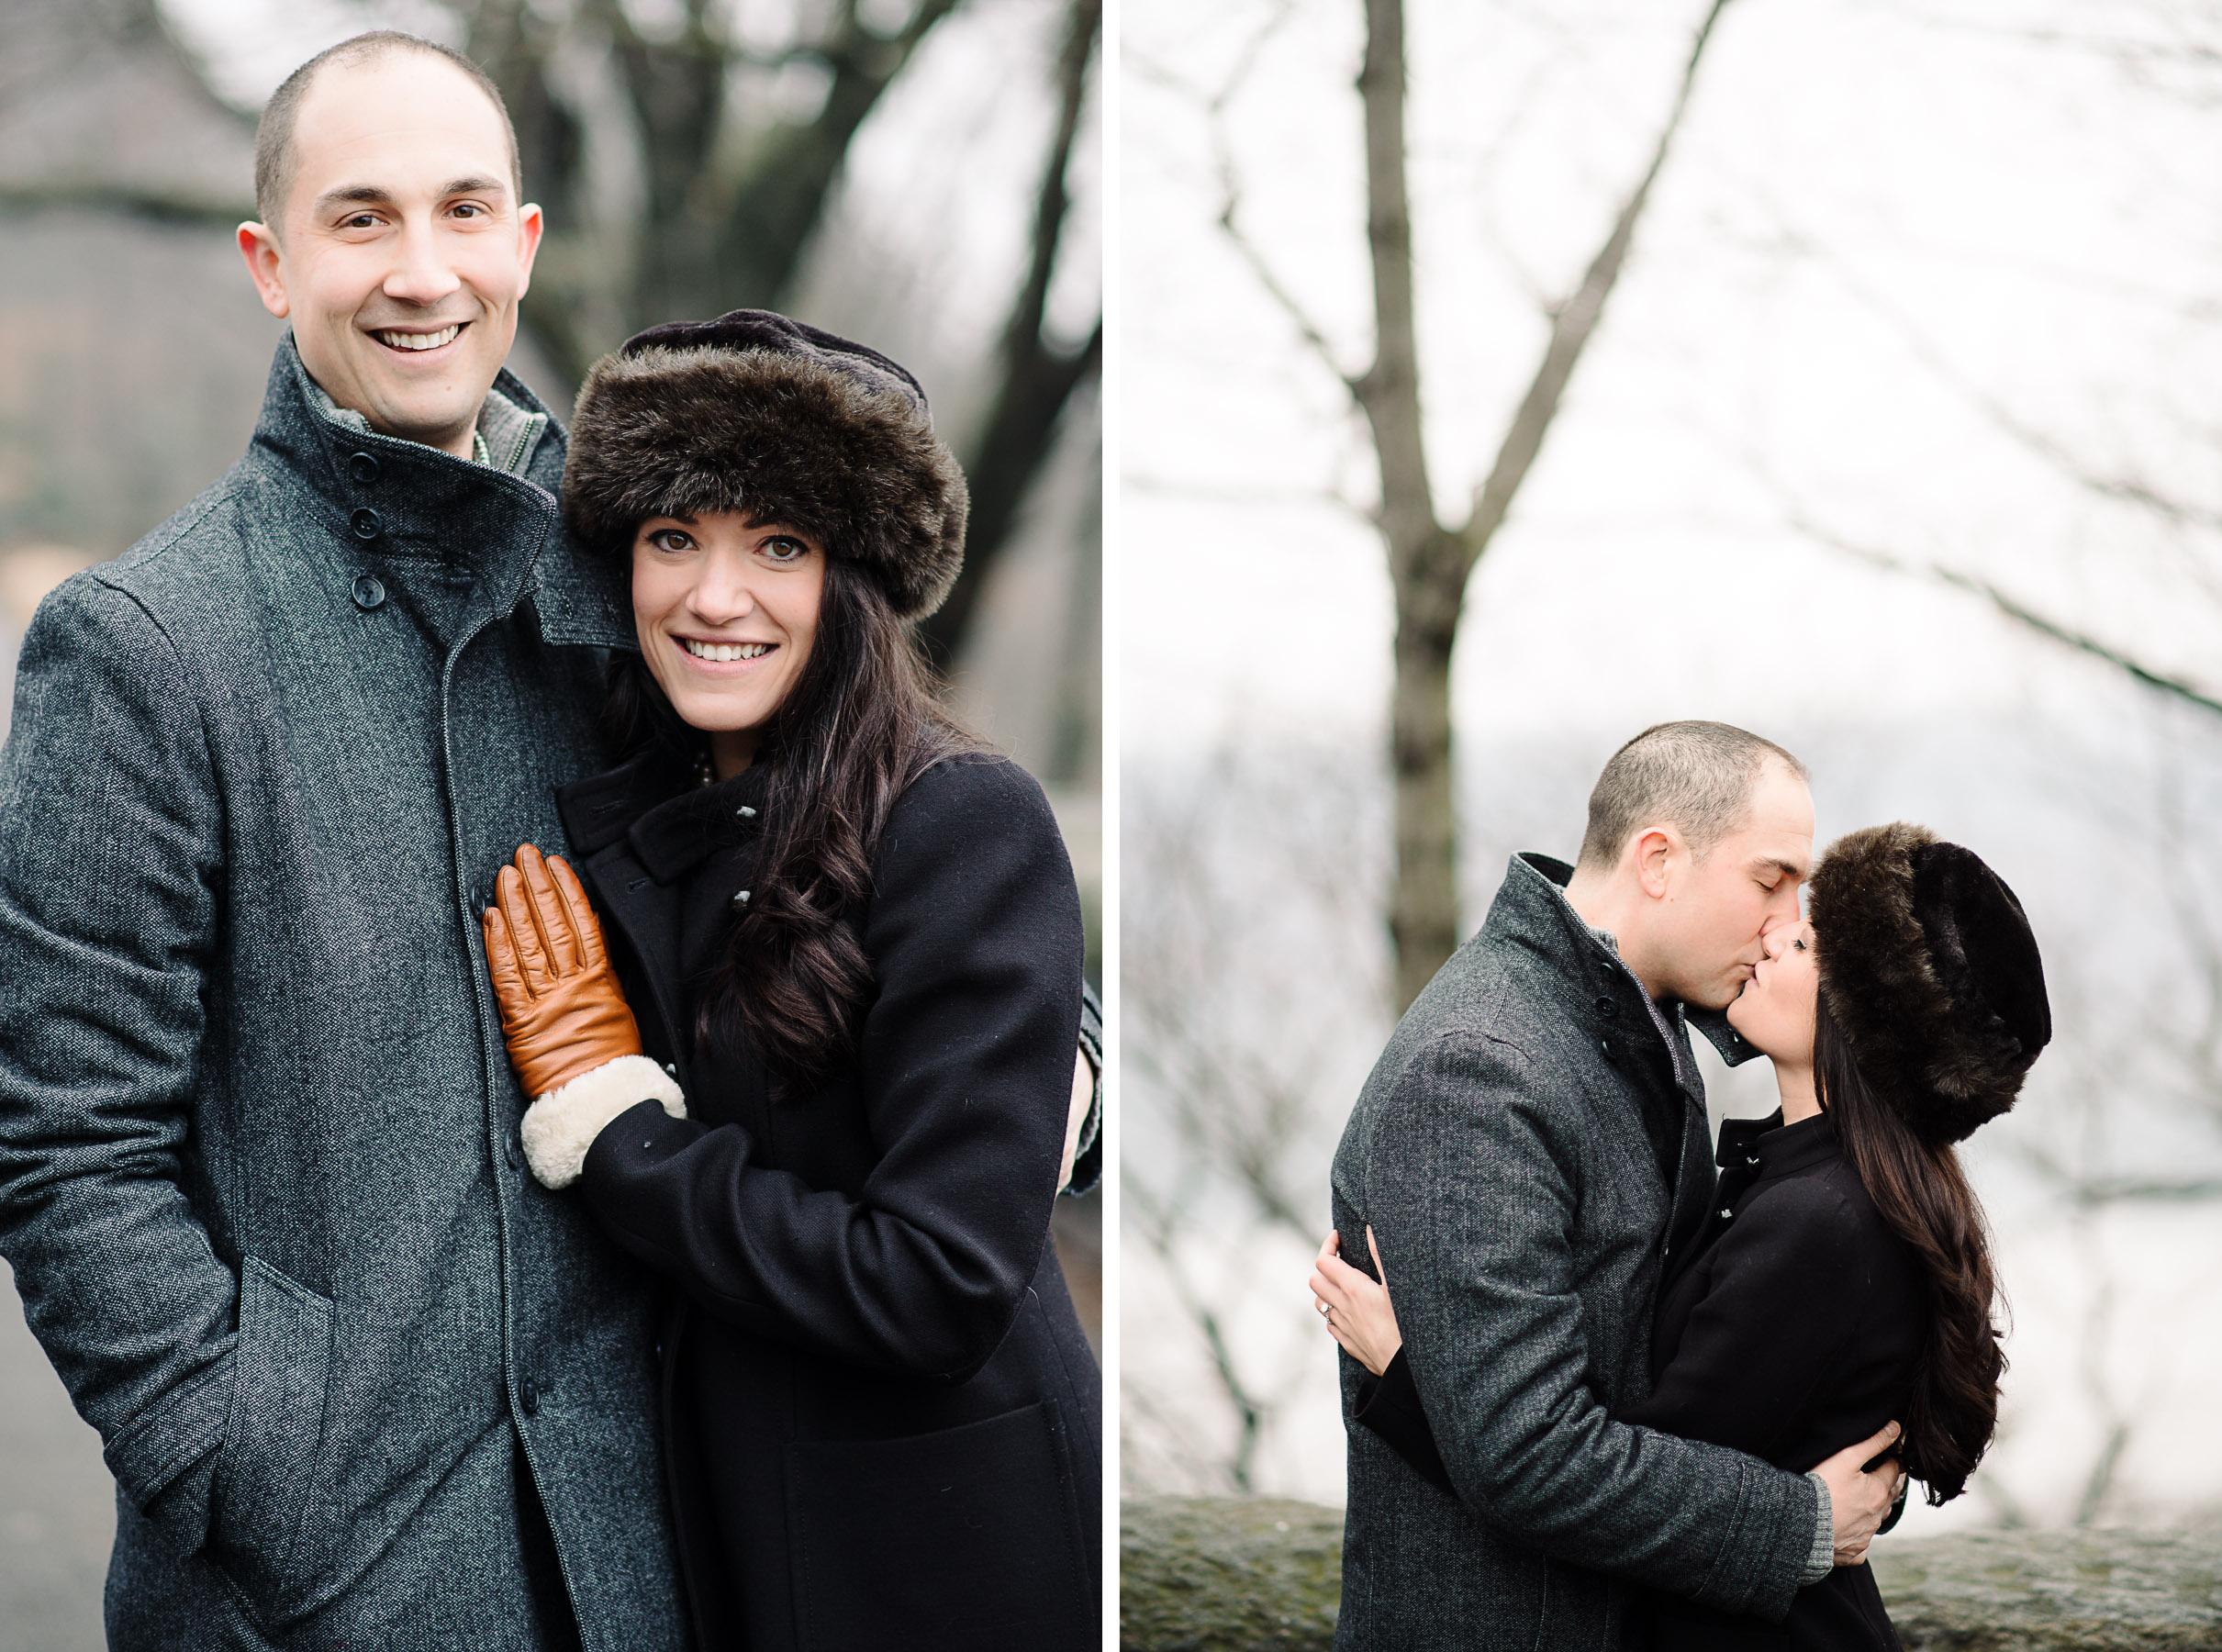 Cloisters Fort Tryon Park Engagement Photography Faux Fur Hat